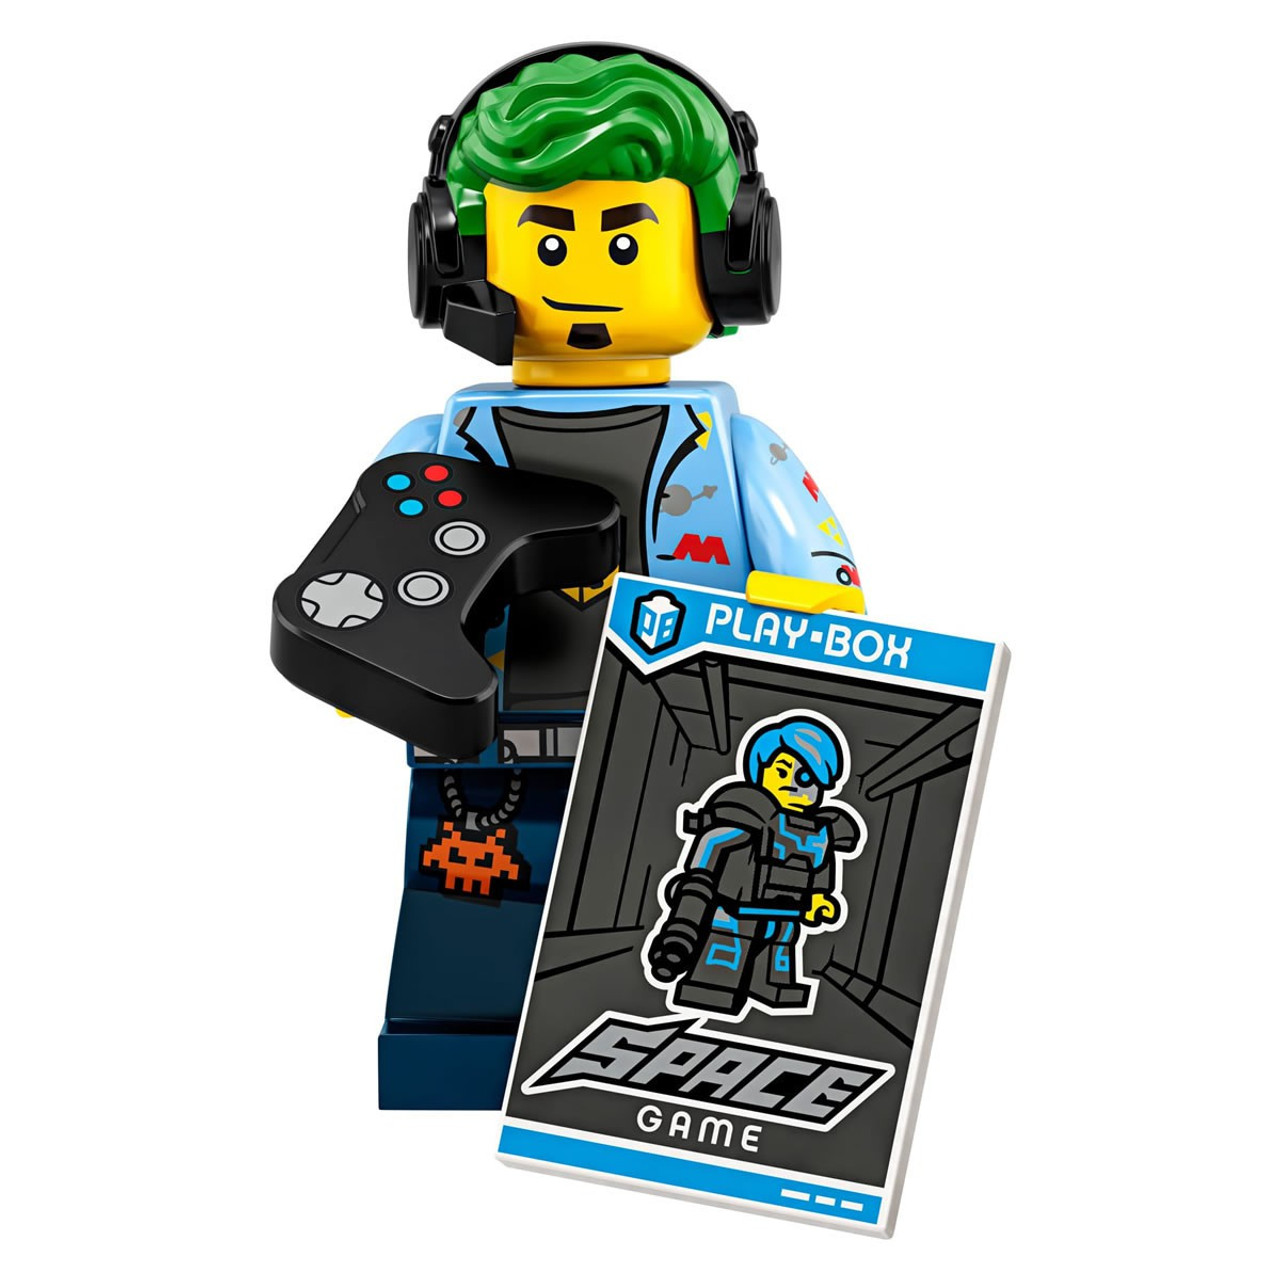 LEGO THE ROCK STAR minifigure LEGO MINIFIGURE SERIES 12 complete